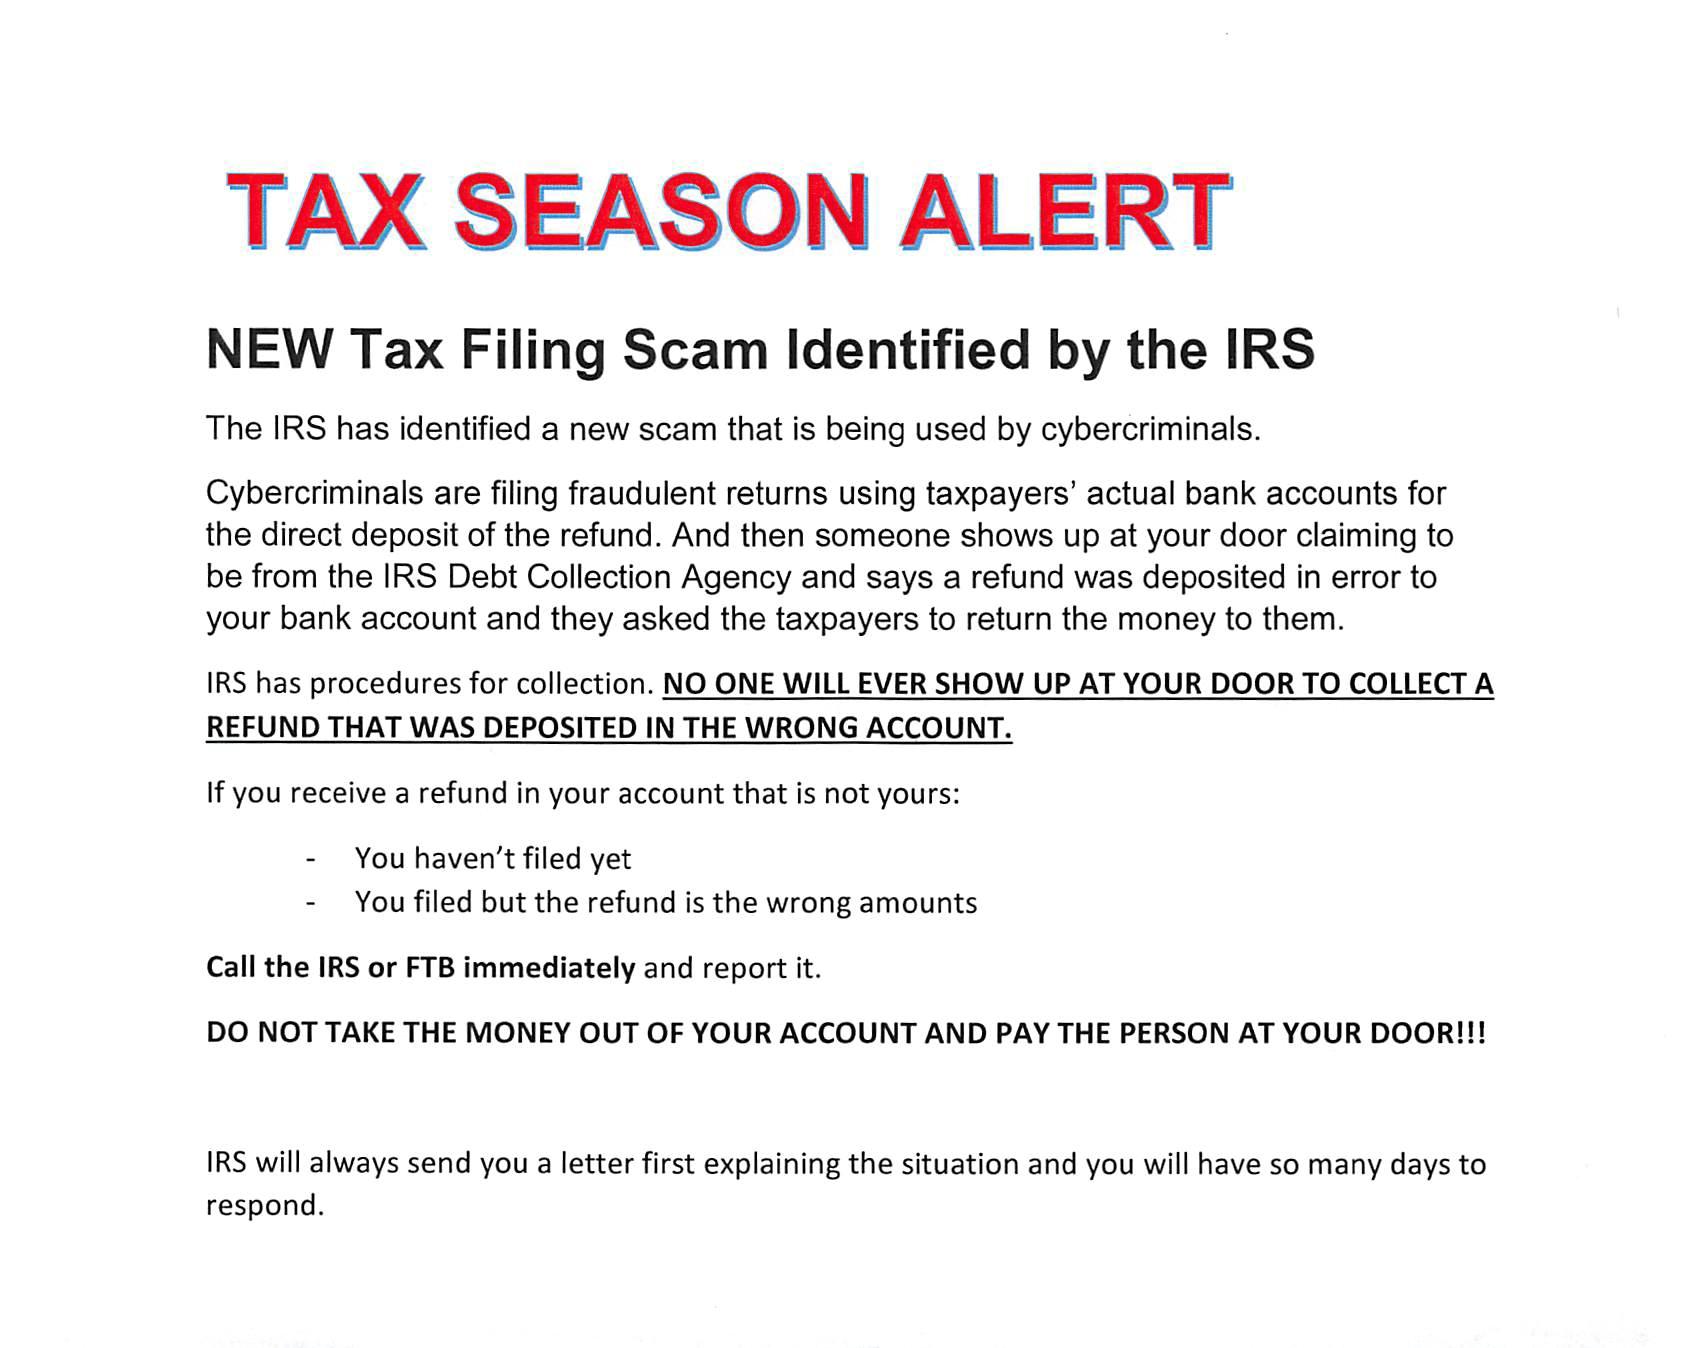 New Tax Scam Alert